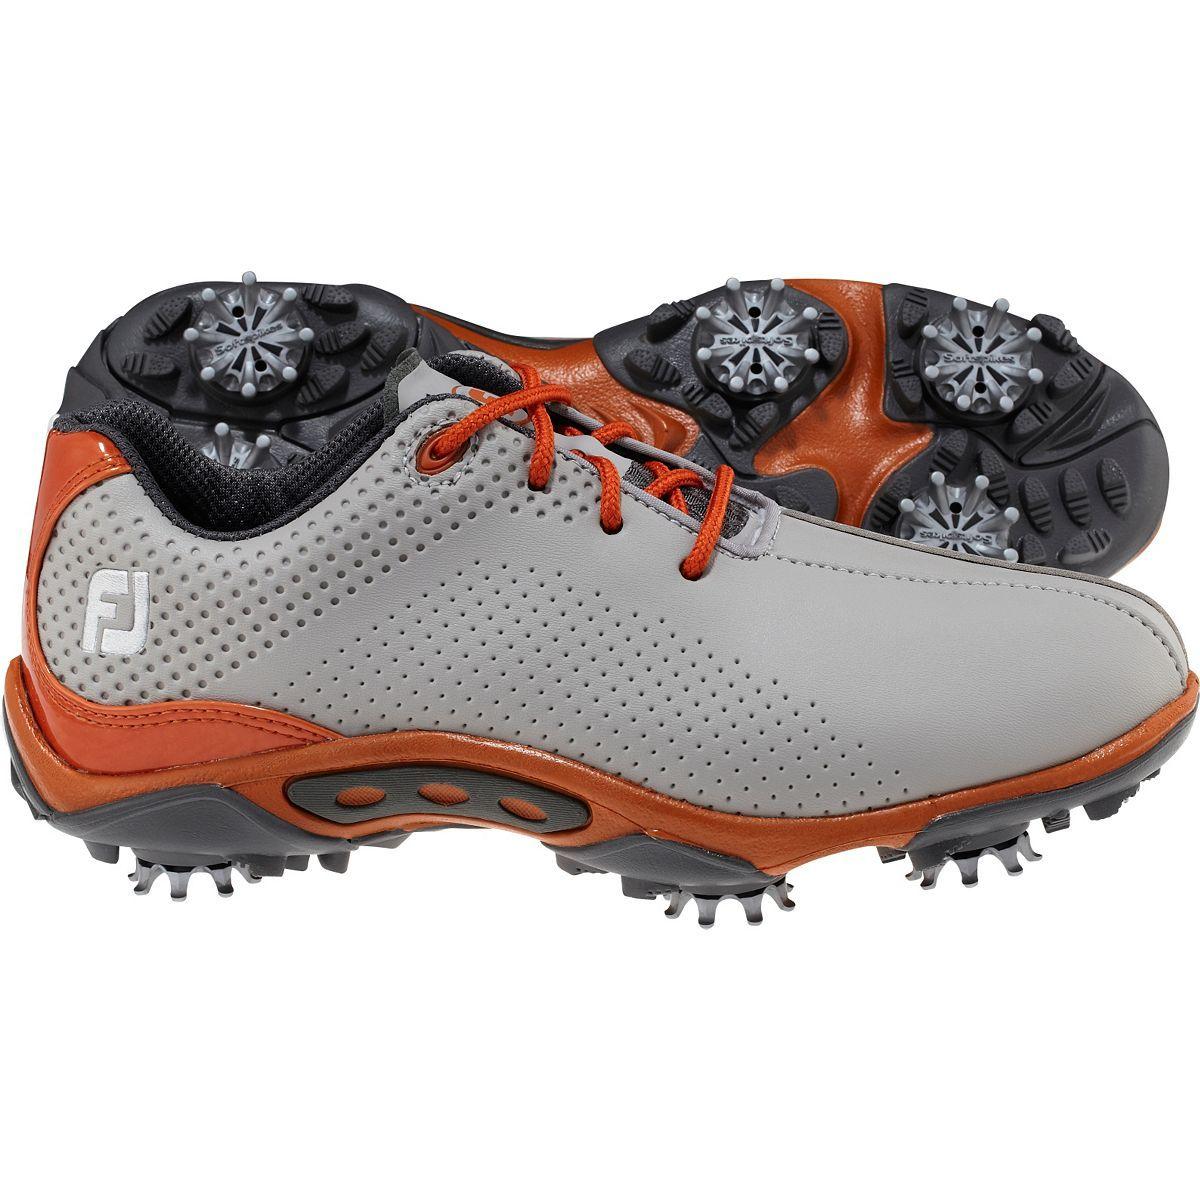 Footjoy juniors dna golf shoes greyorange fj45069